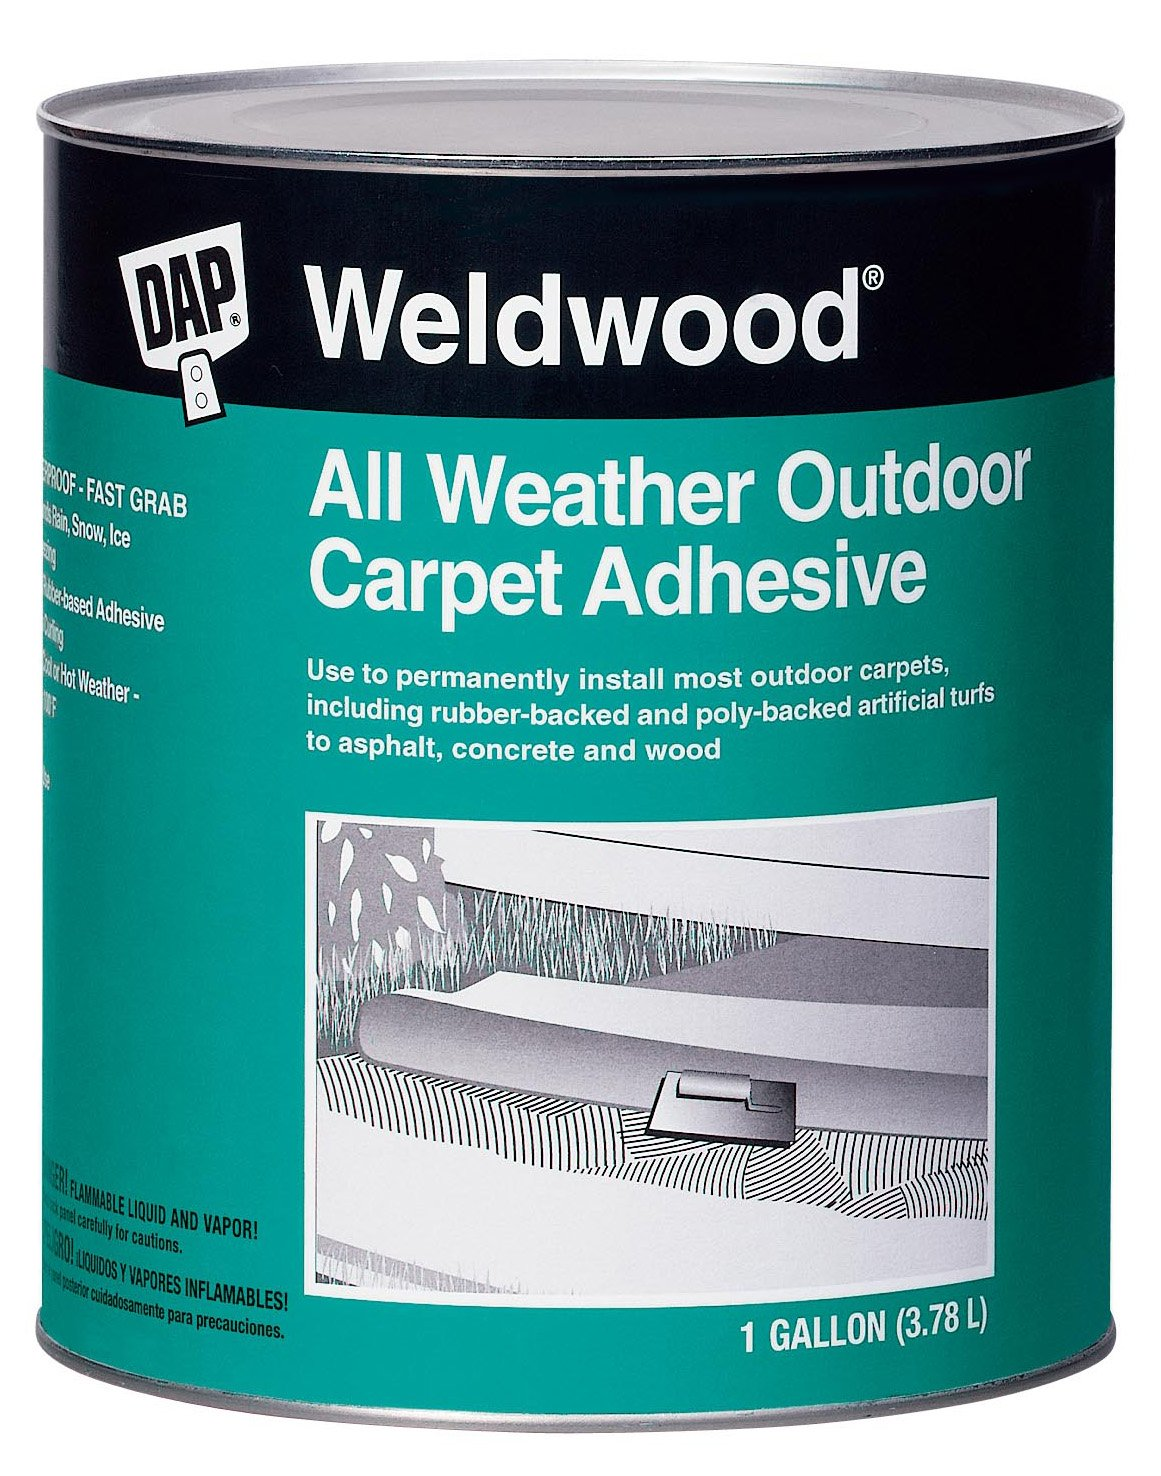 Amazon dap 00442 weldwood all weather outdoor carpet adhesive amazon dap 00442 weldwood all weather outdoor carpet adhesive 1 quart home improvement baanklon Choice Image